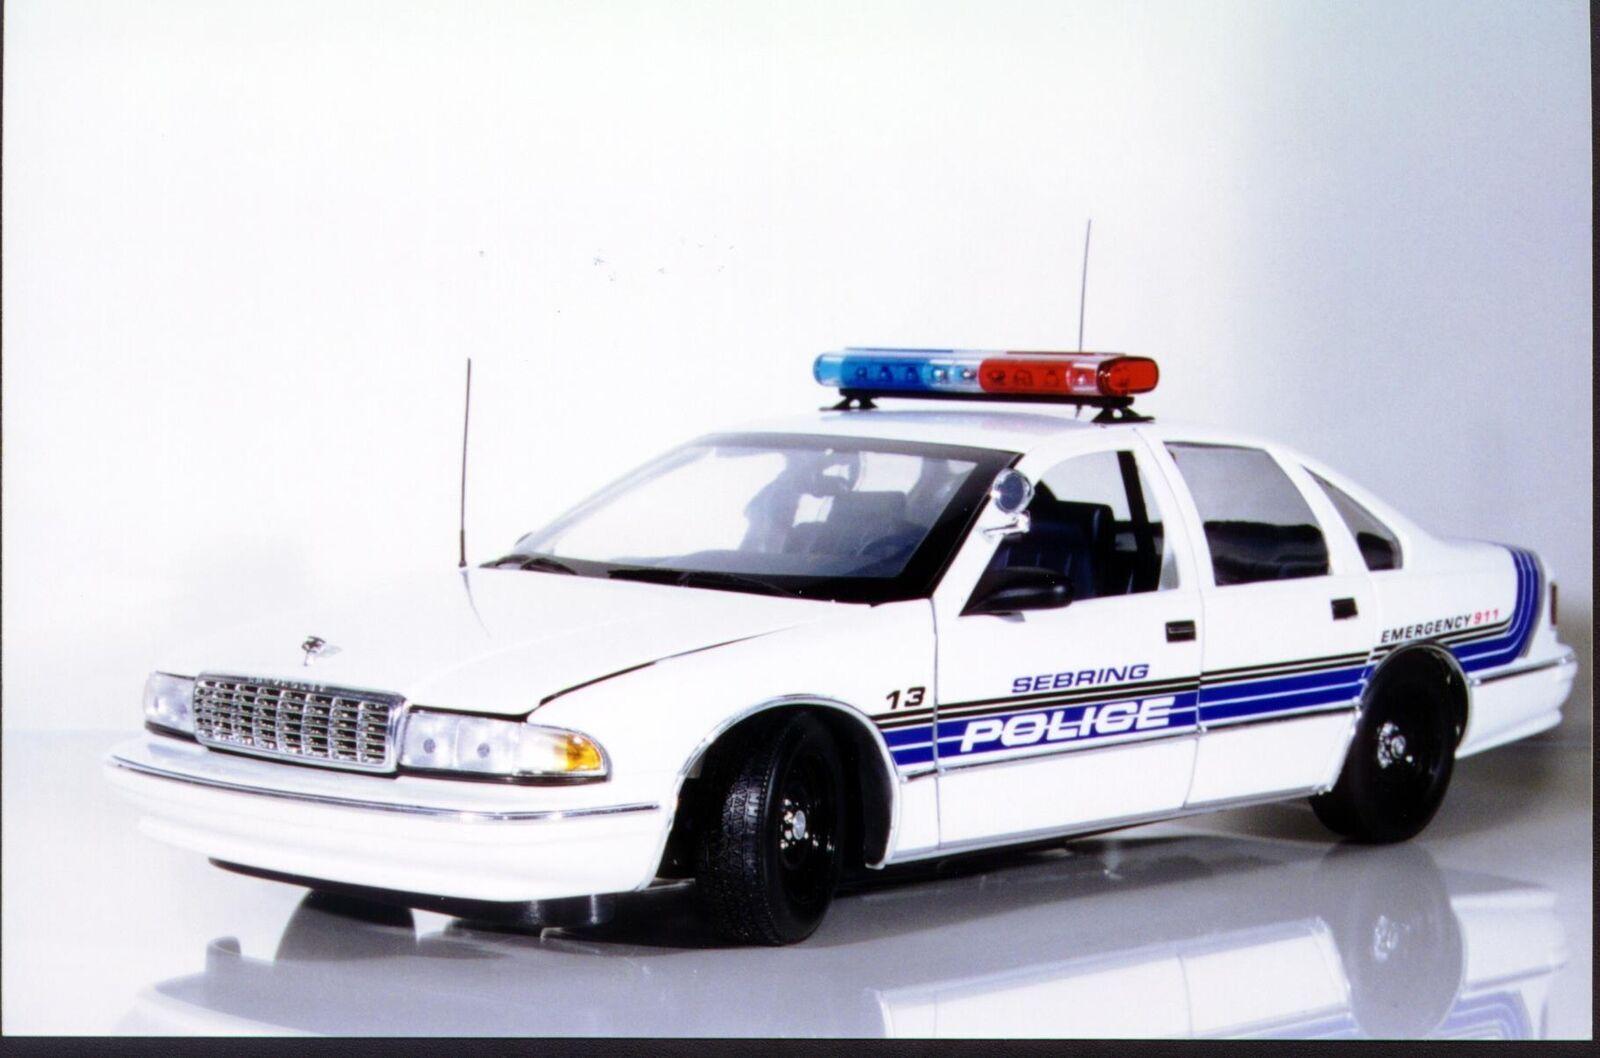 UT modelos Chevy Caprice SEBRING, Florida PD policía